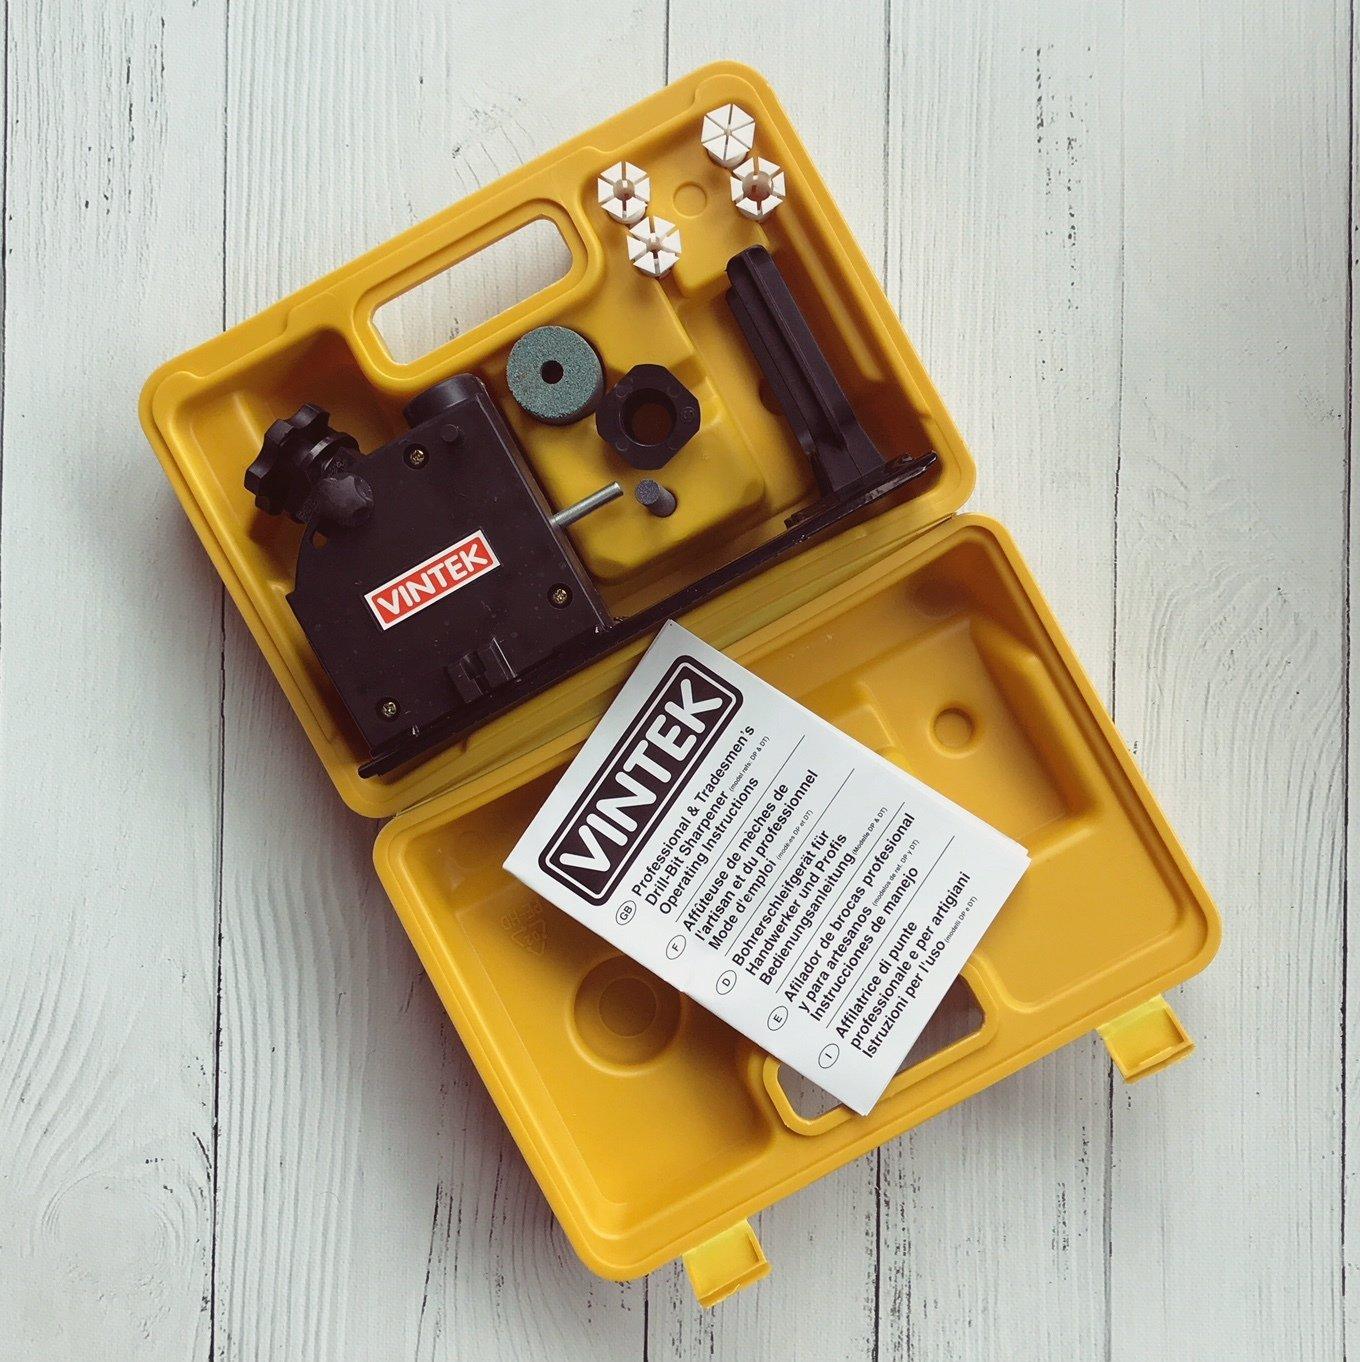 Vintek Professional Drill-Bit Sharpener